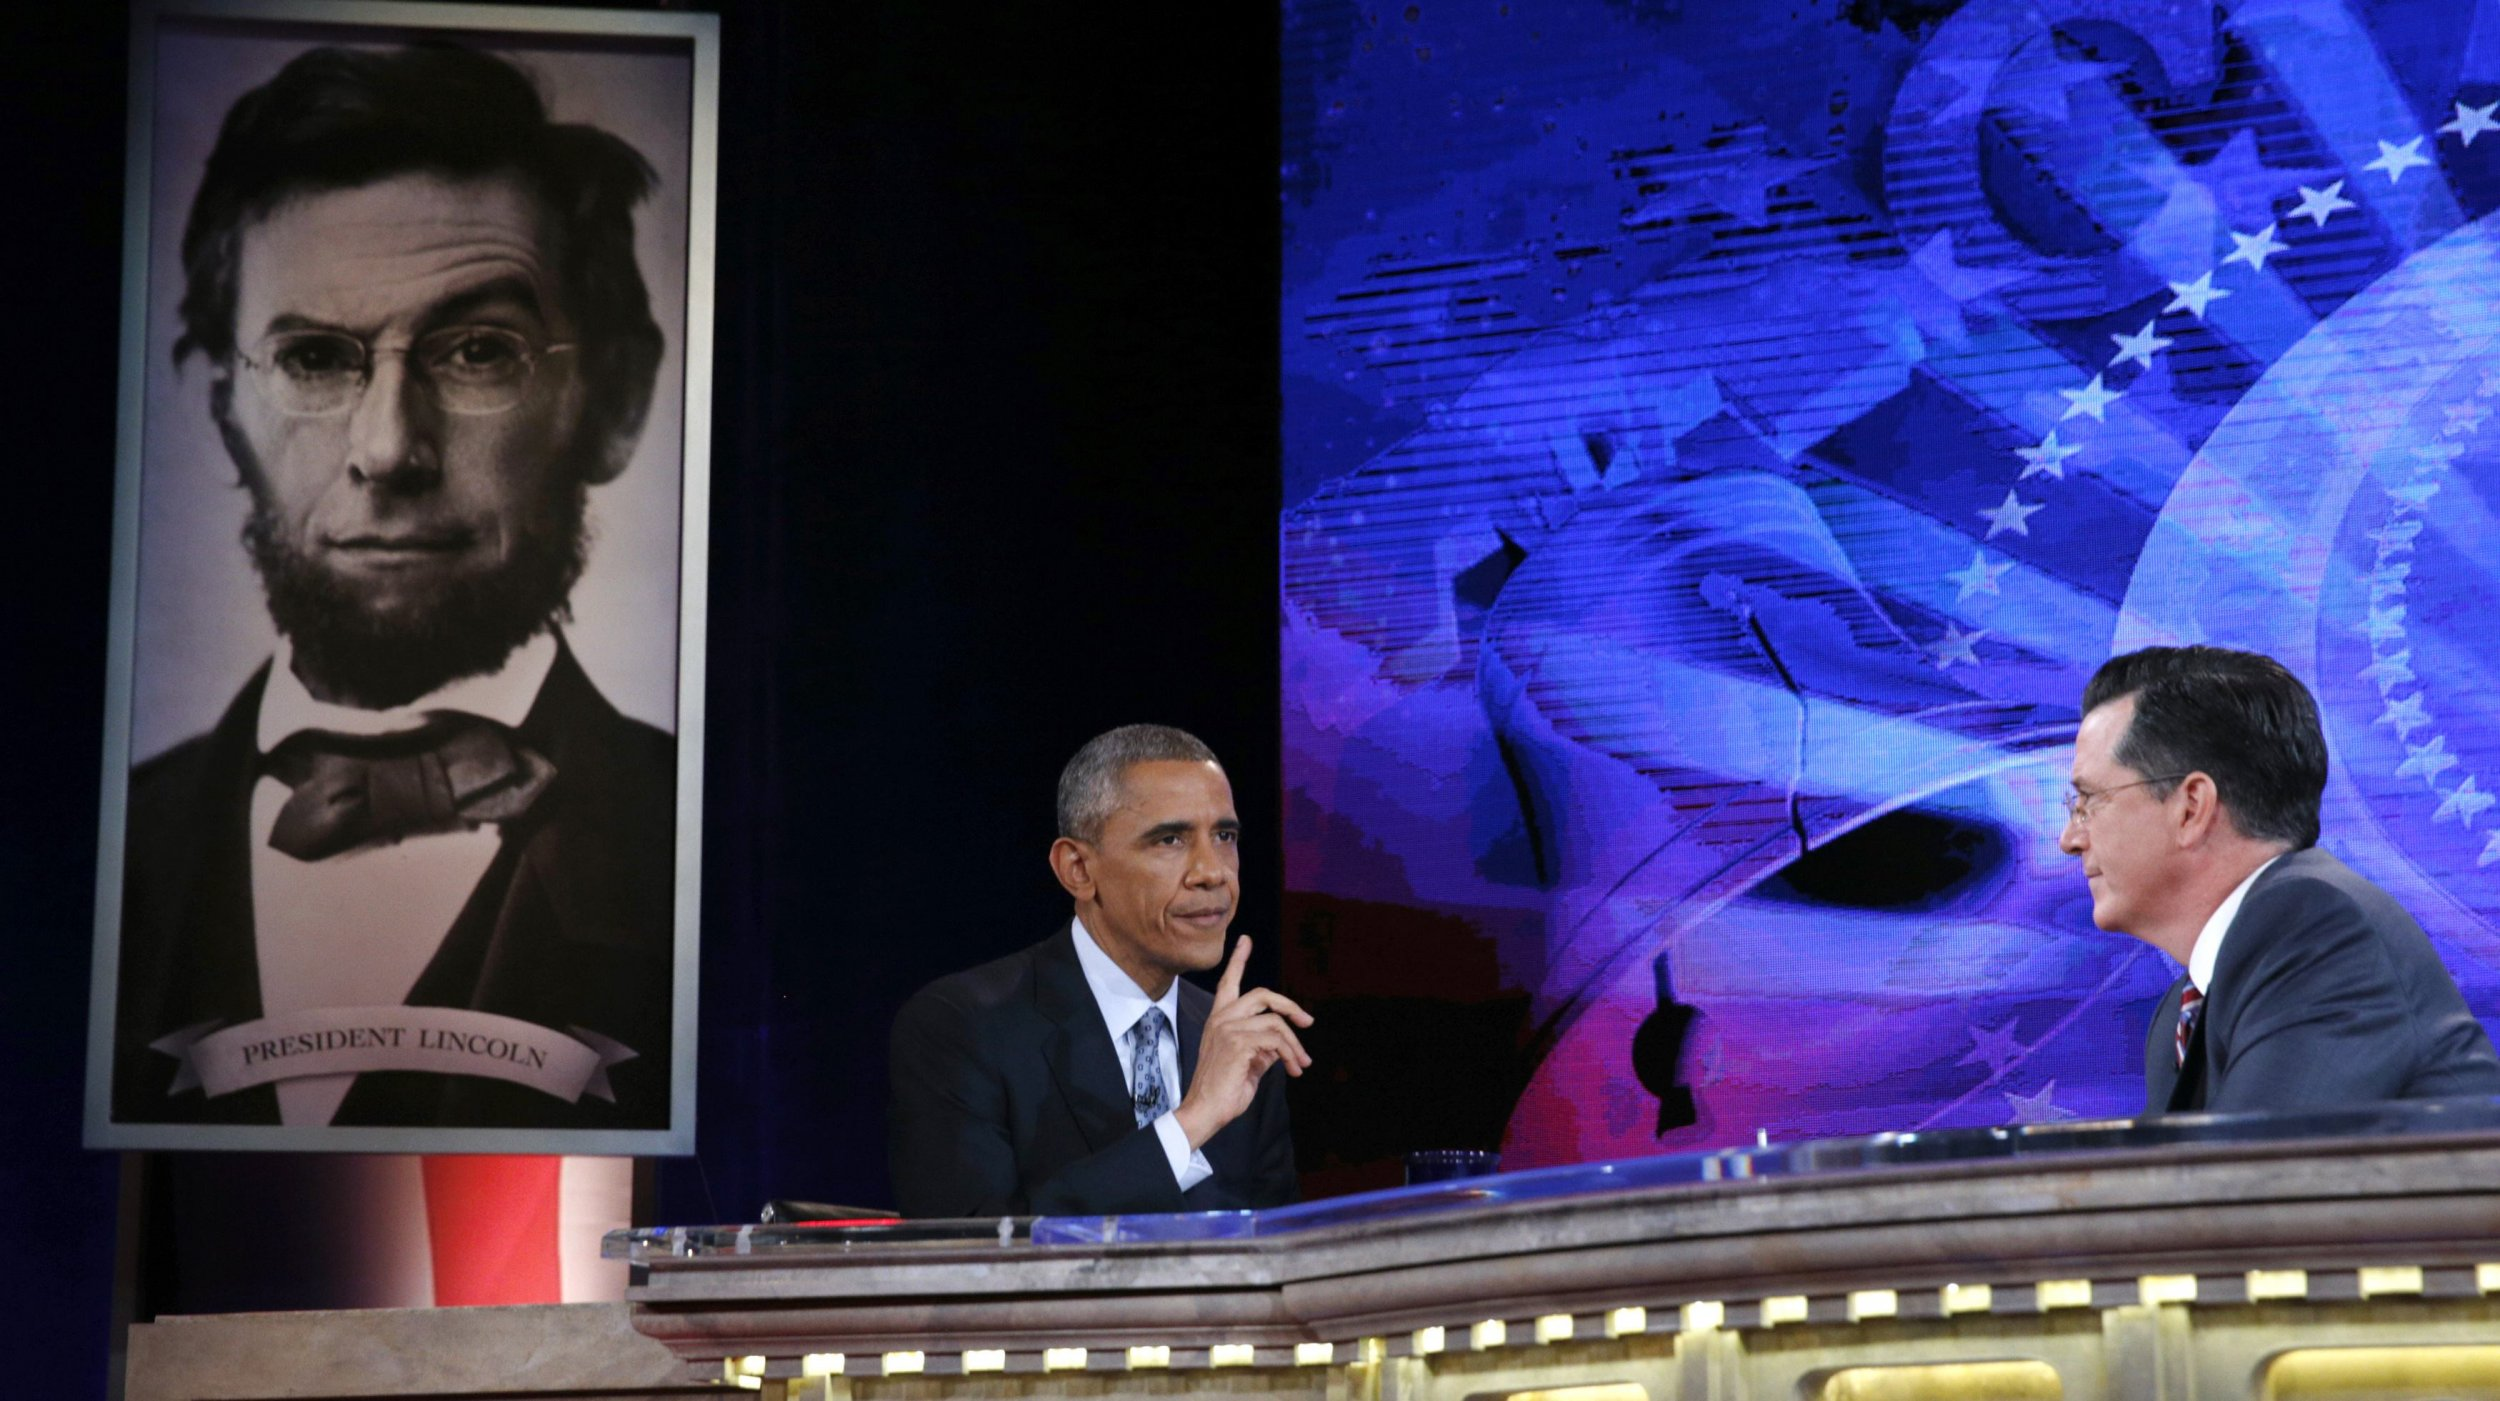 Obama on Colbert